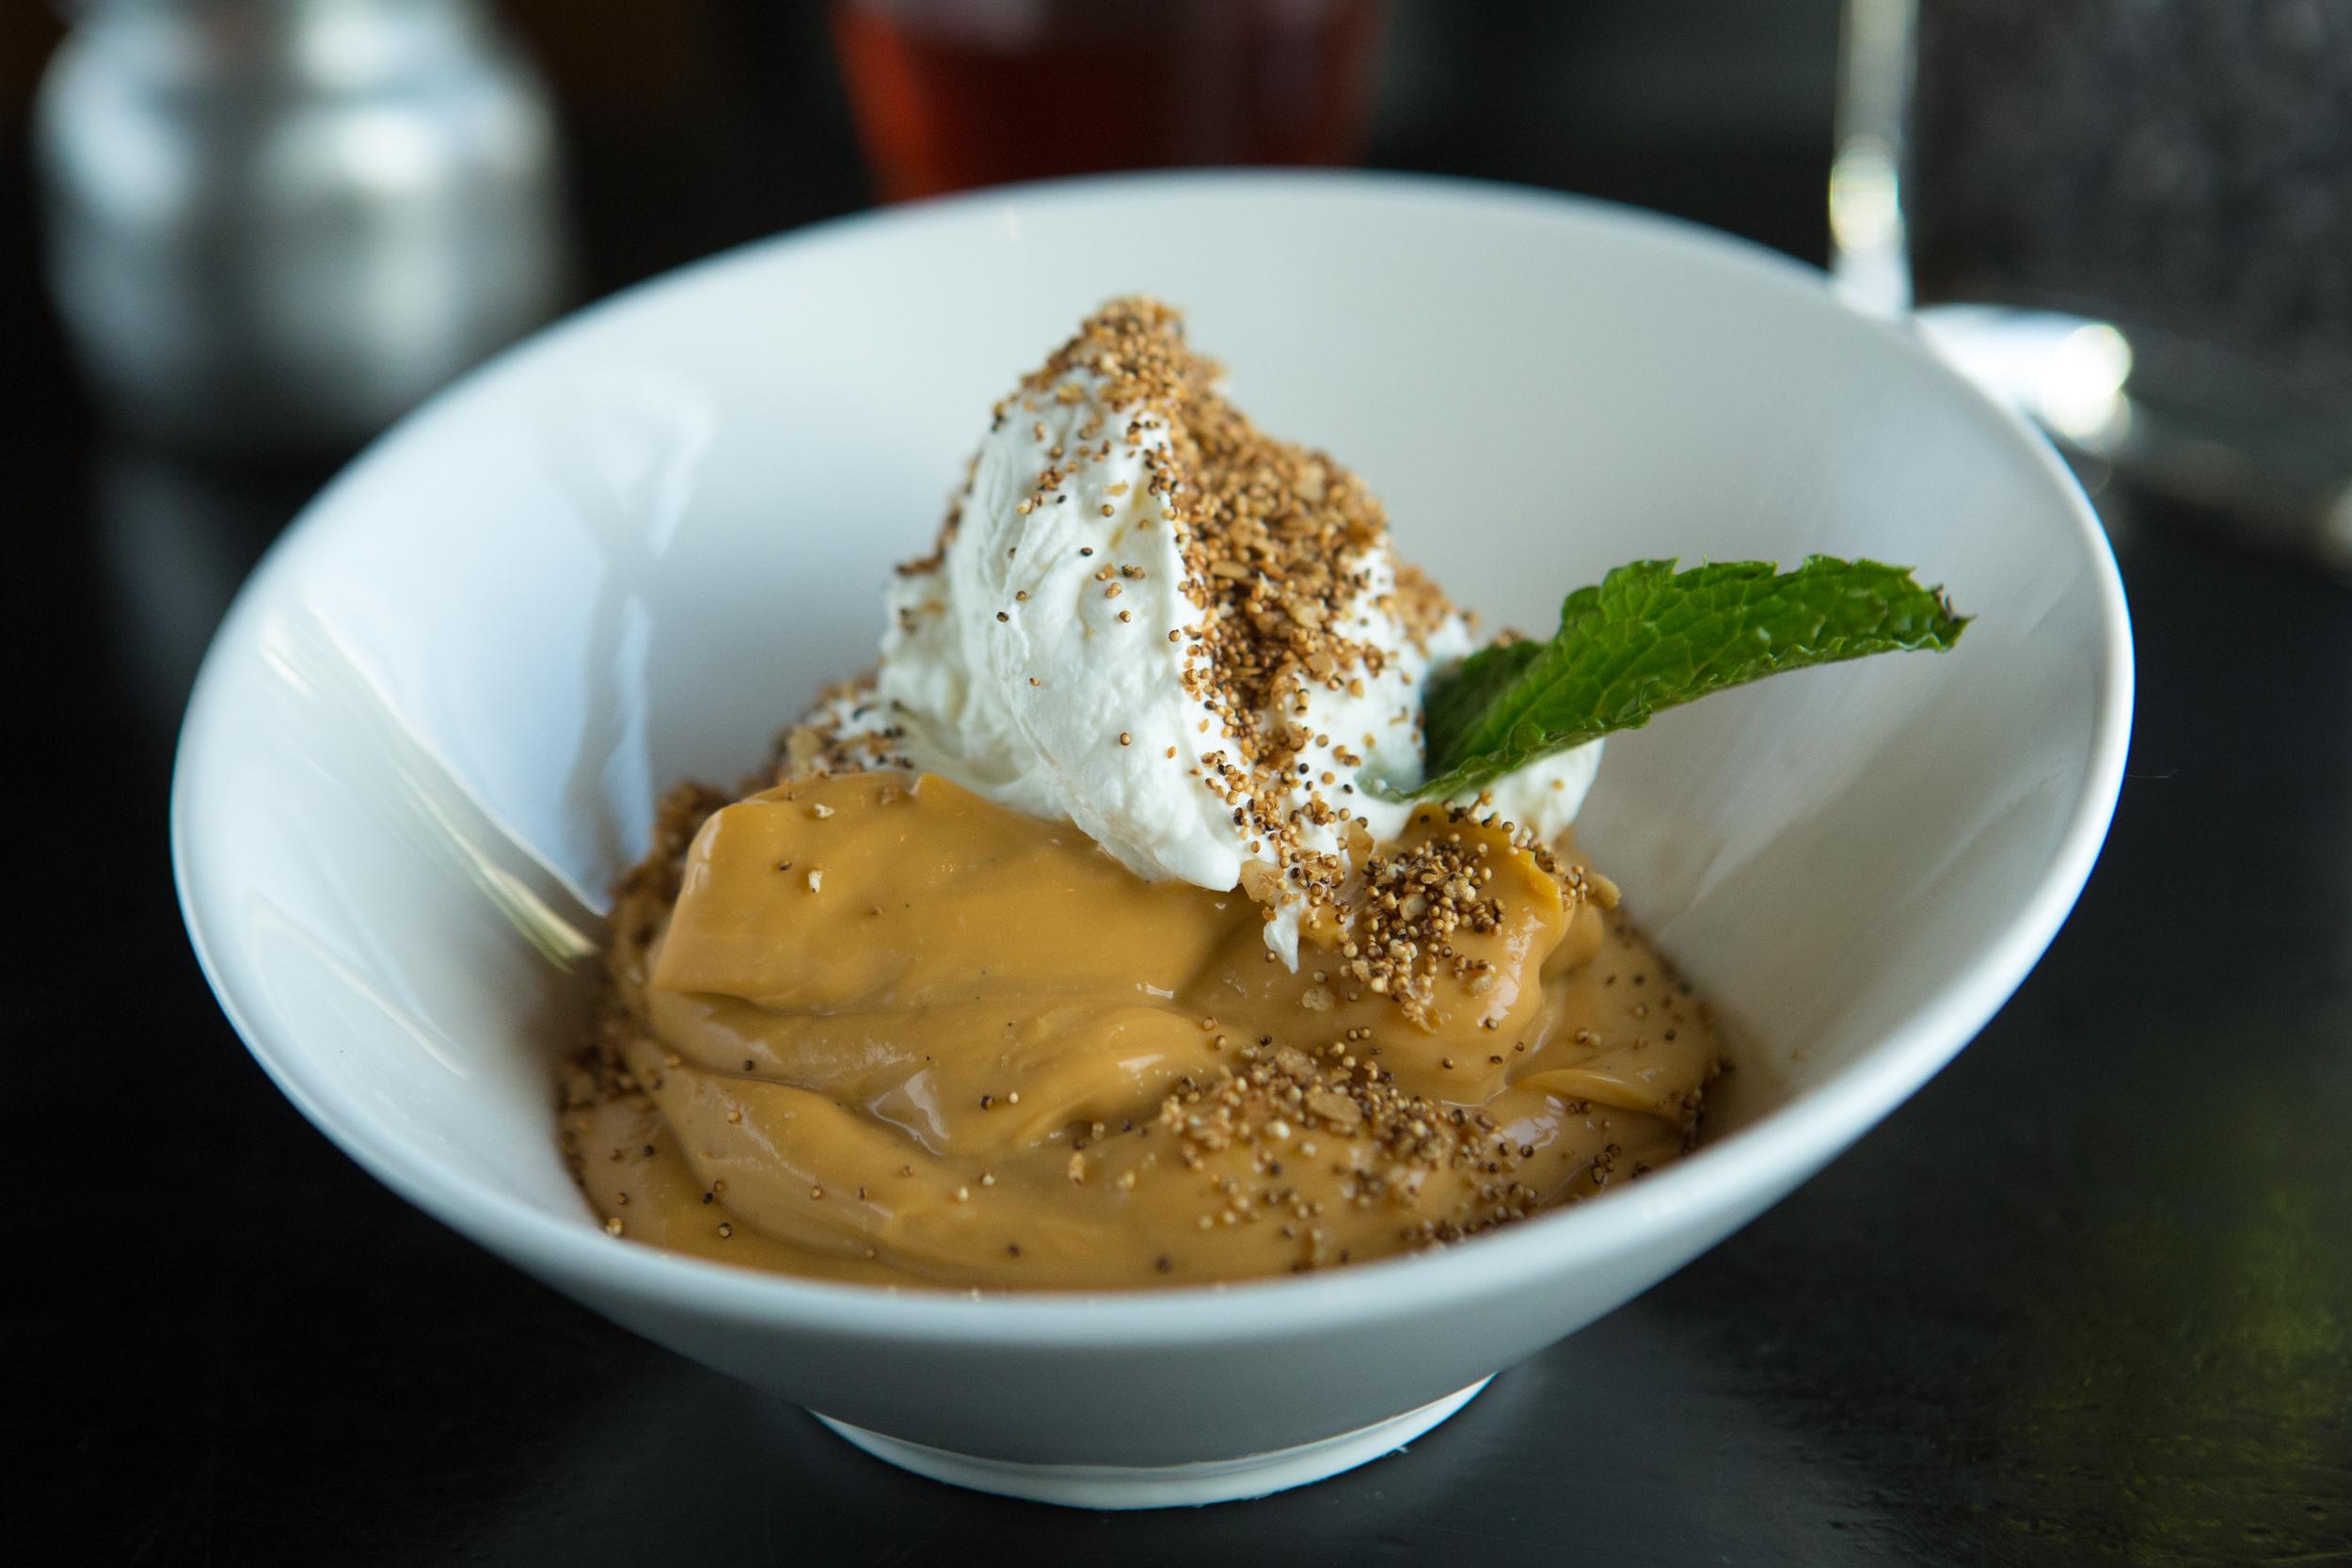 Butterscotch pudding at Moonshine 152.